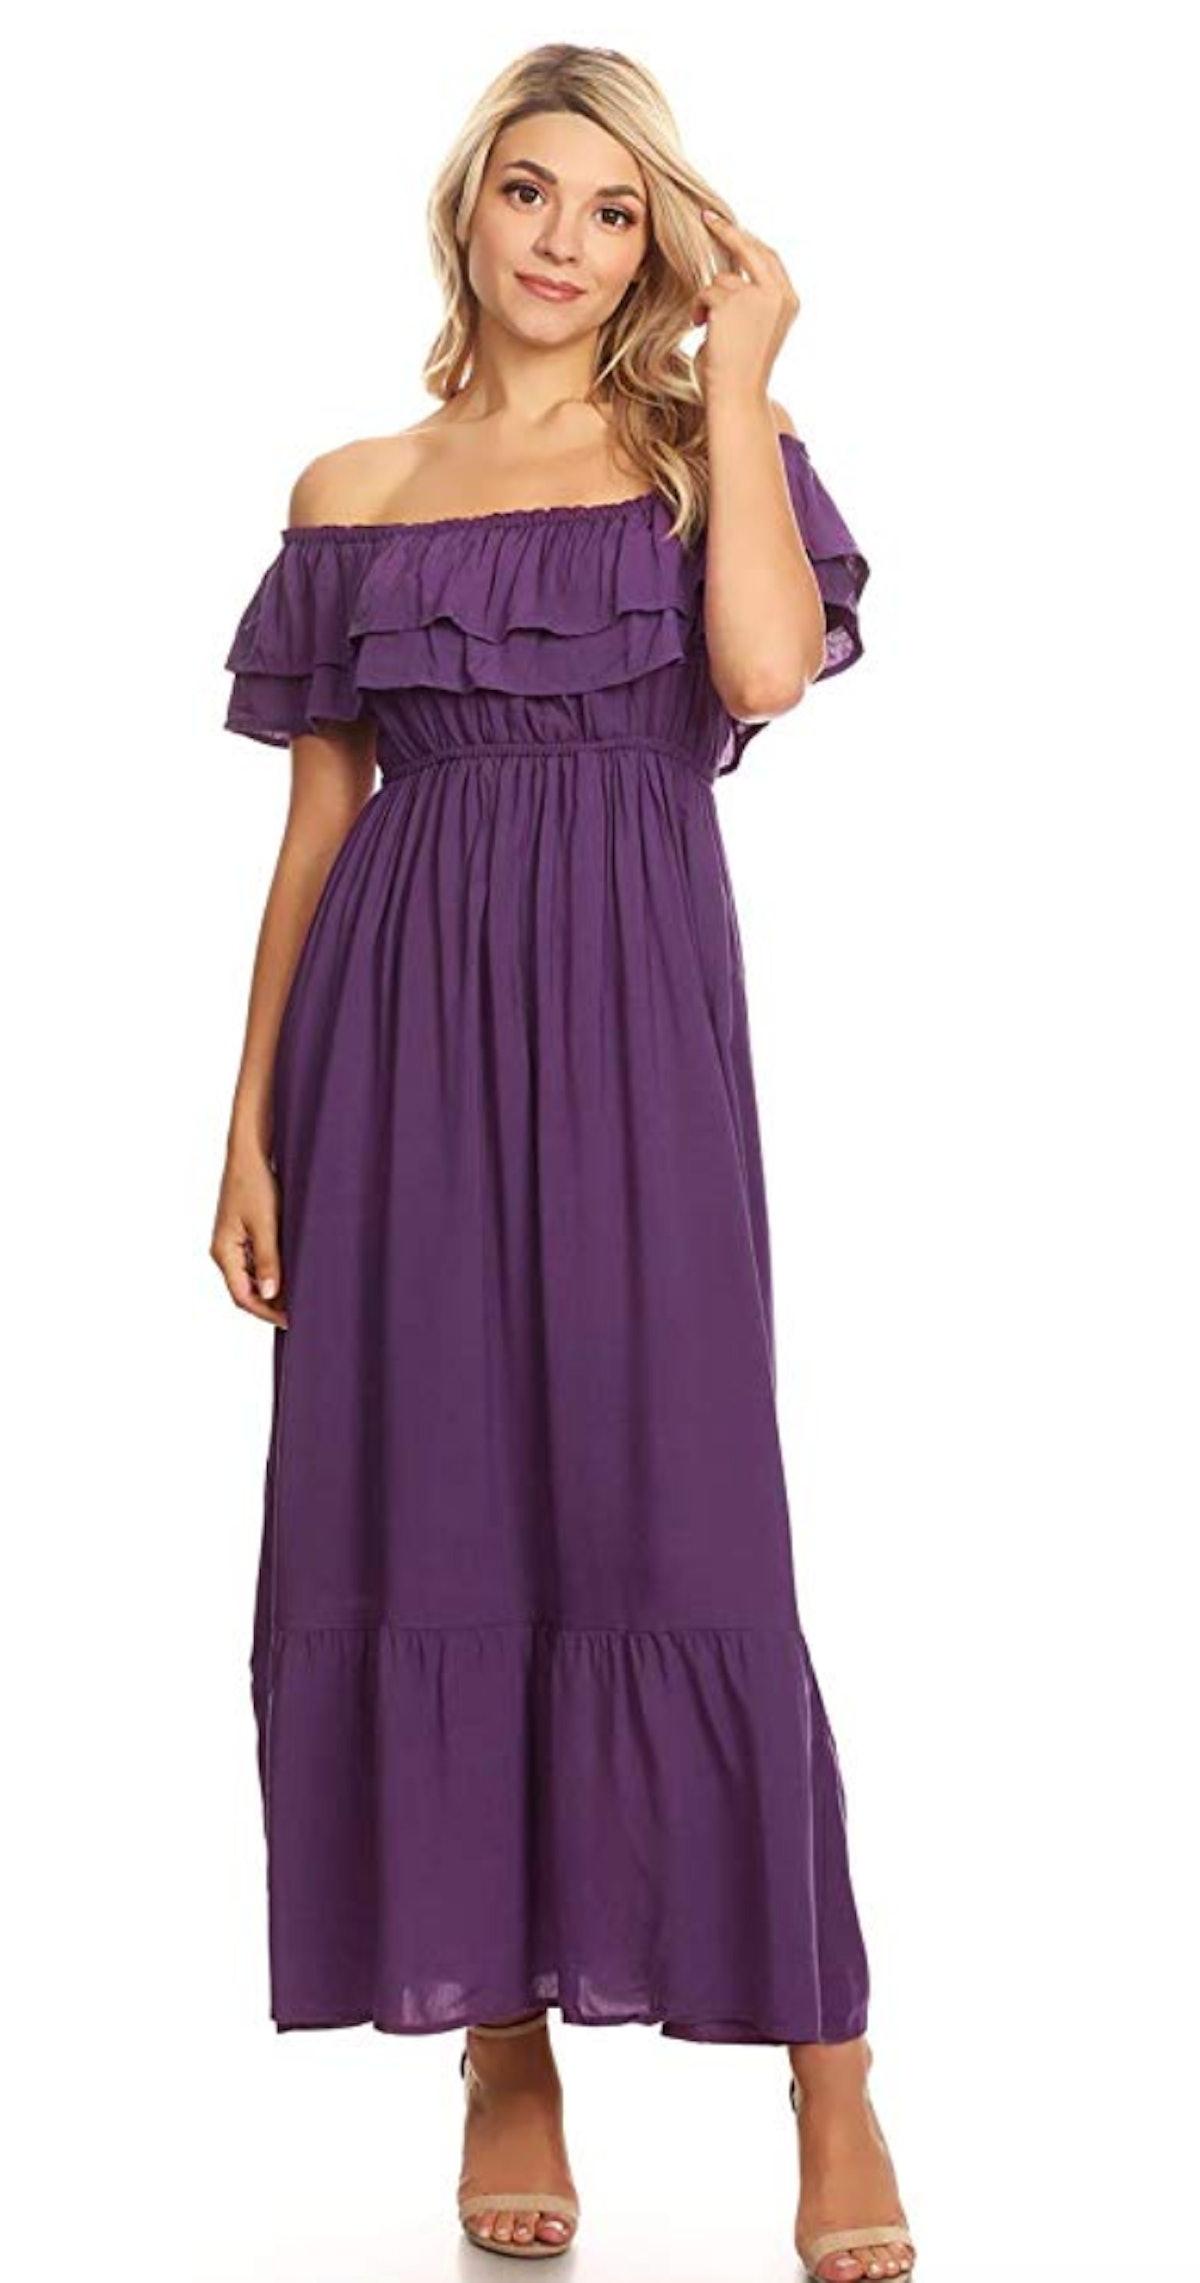 Anna-Kaci Womens Boho Peasant Ruffle Stretchy Short Sleeve Long Dress